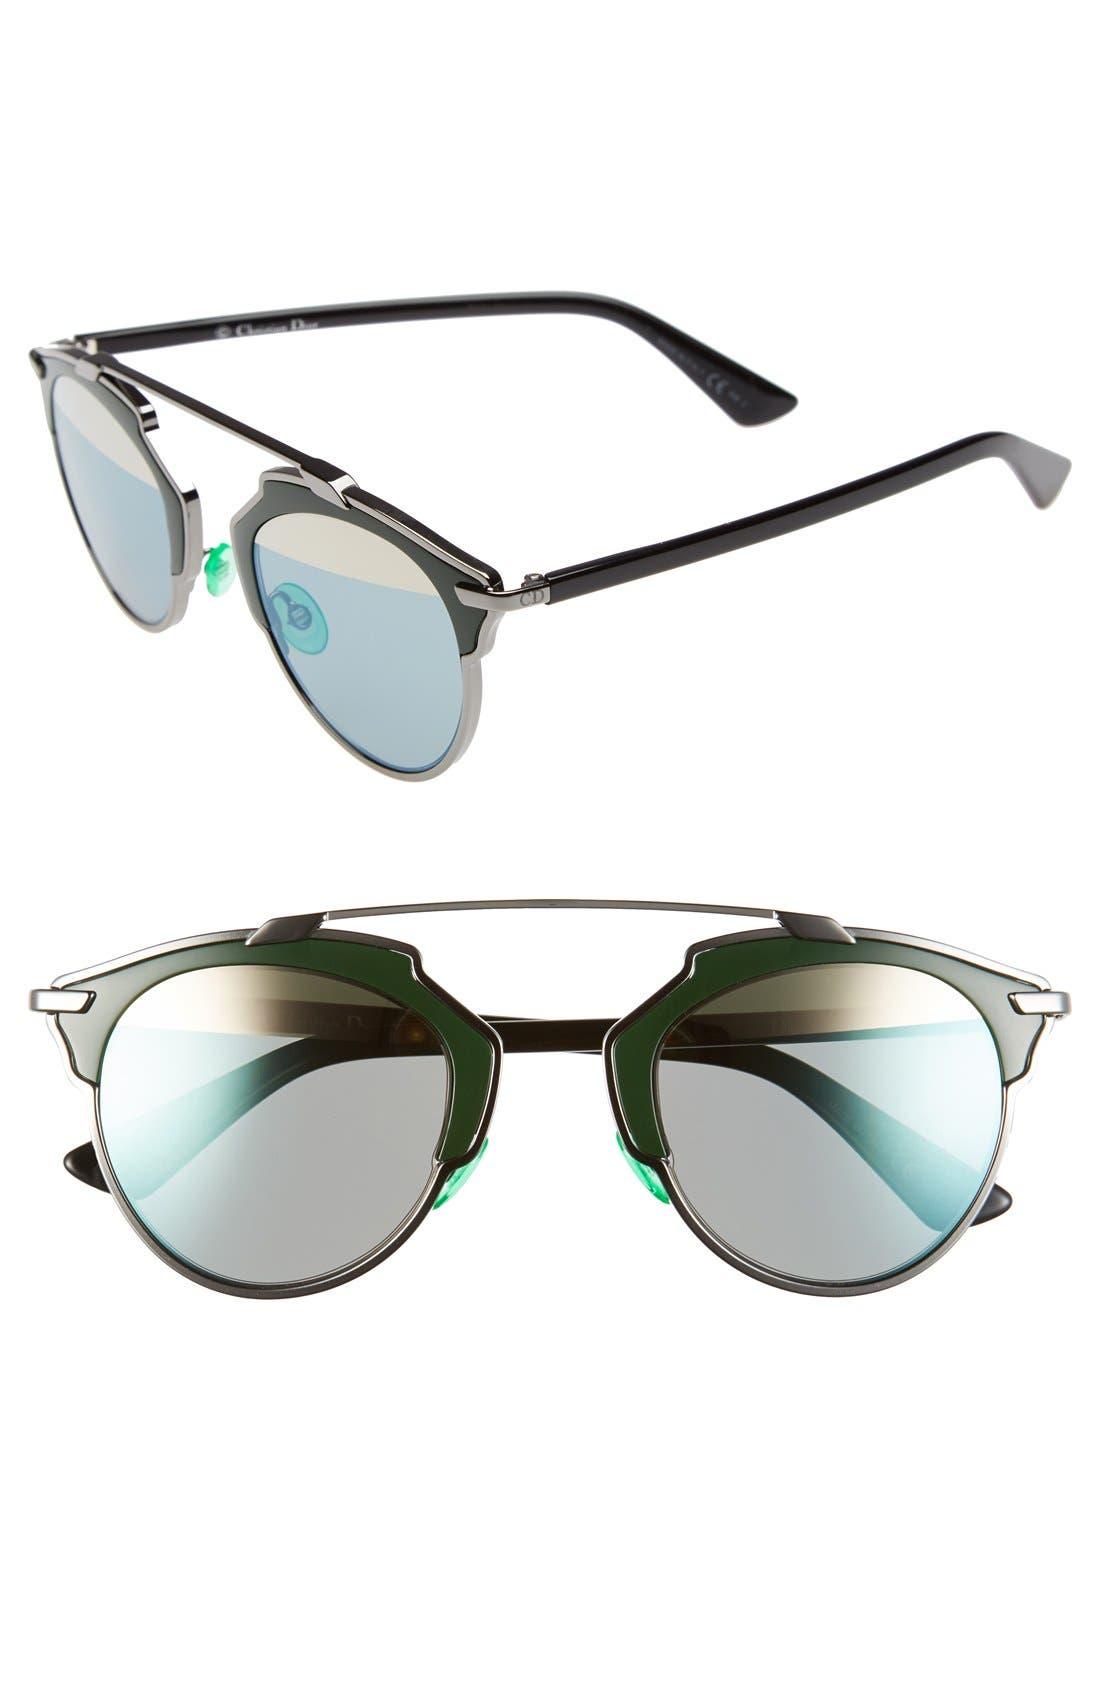 So Real 48mm Brow Bar Sunglasses,                         Main,                         color, Ruthenium/ Green/ Black